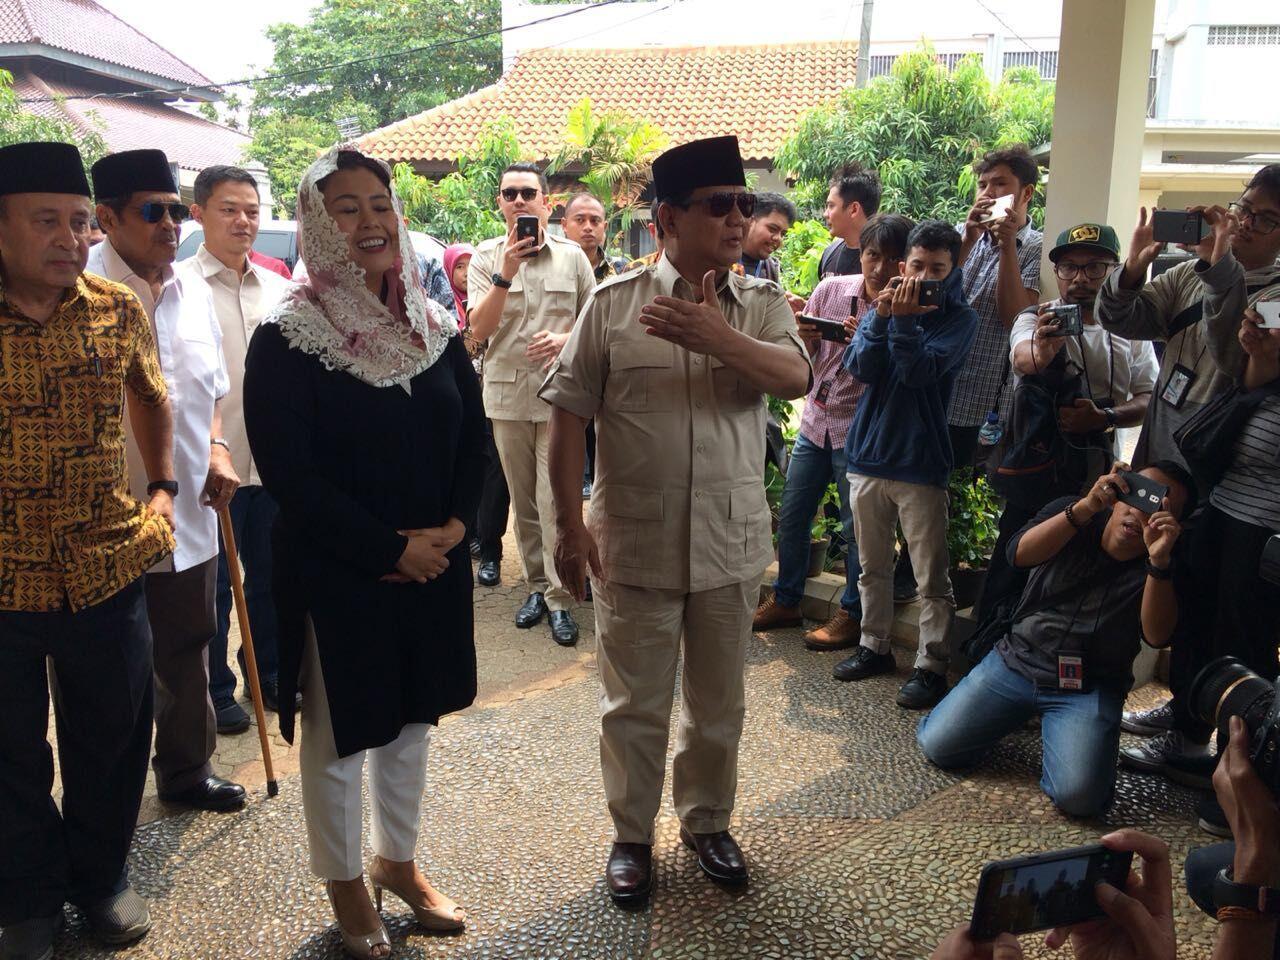 Bantah Usung Khilafah, Prabowo: Saya Pertaruhkan Nyawa untuk Pancasila